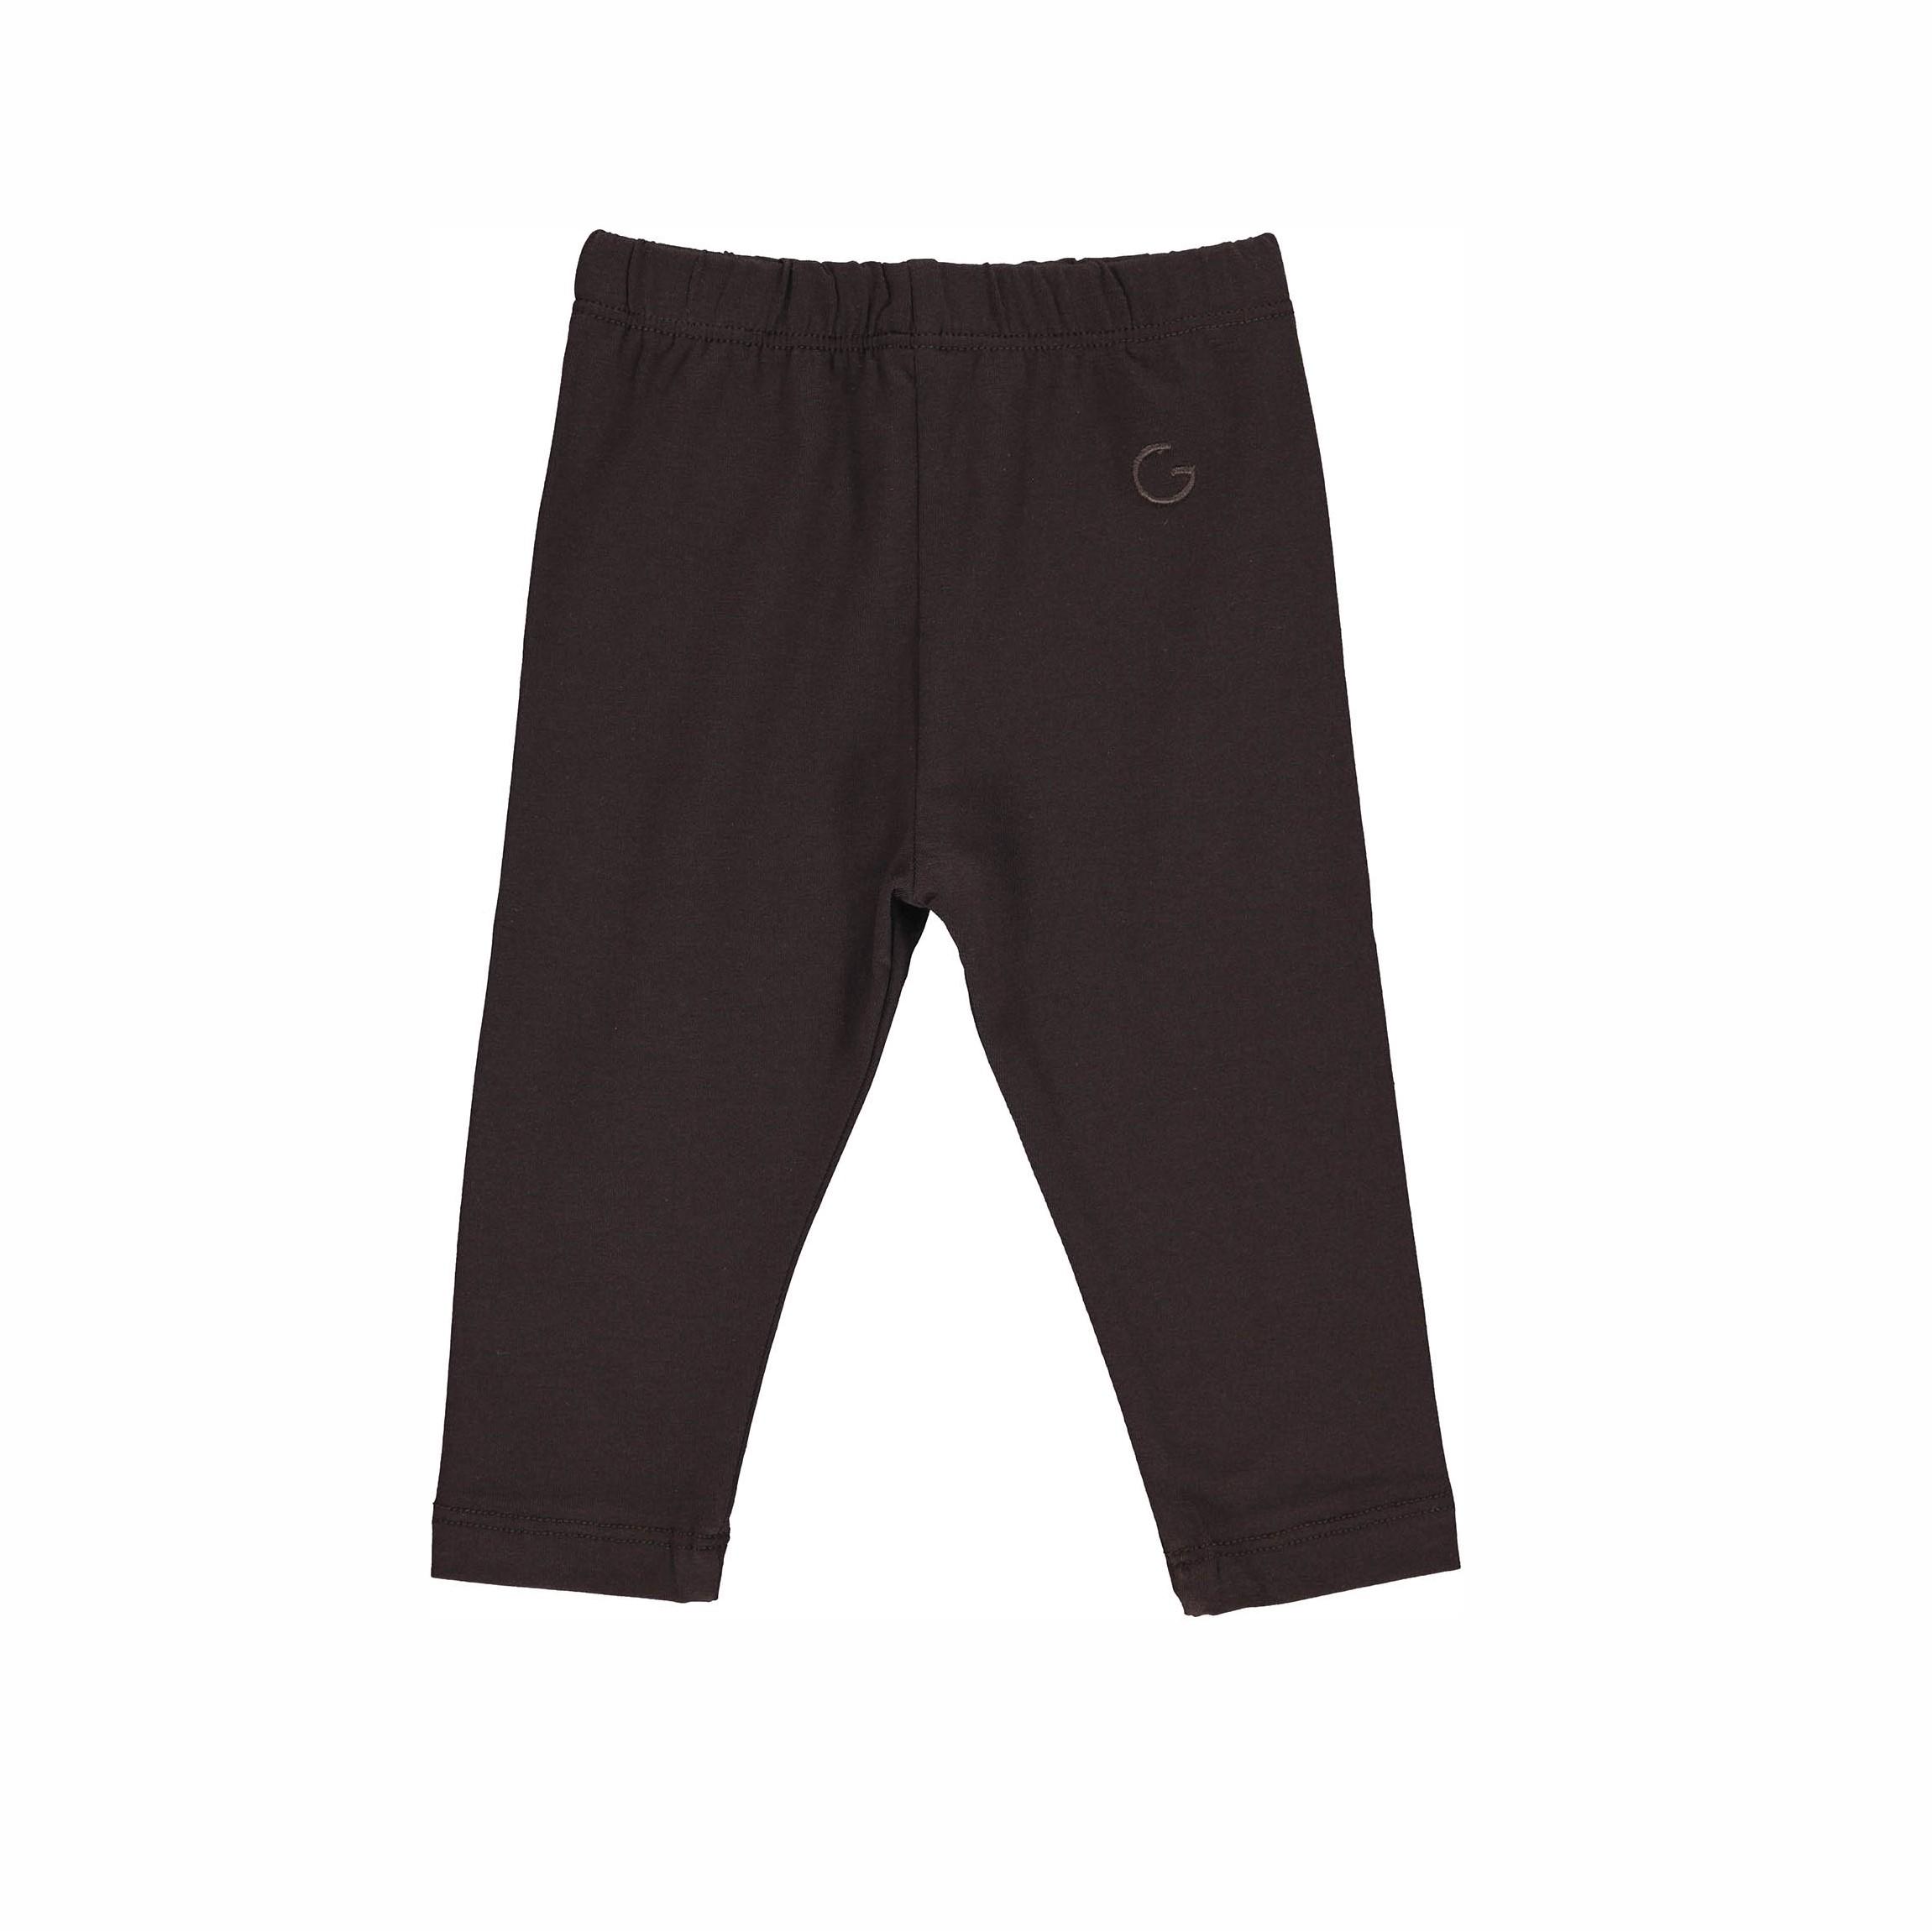 GRO | LEGGINGS, BLACK BROWN